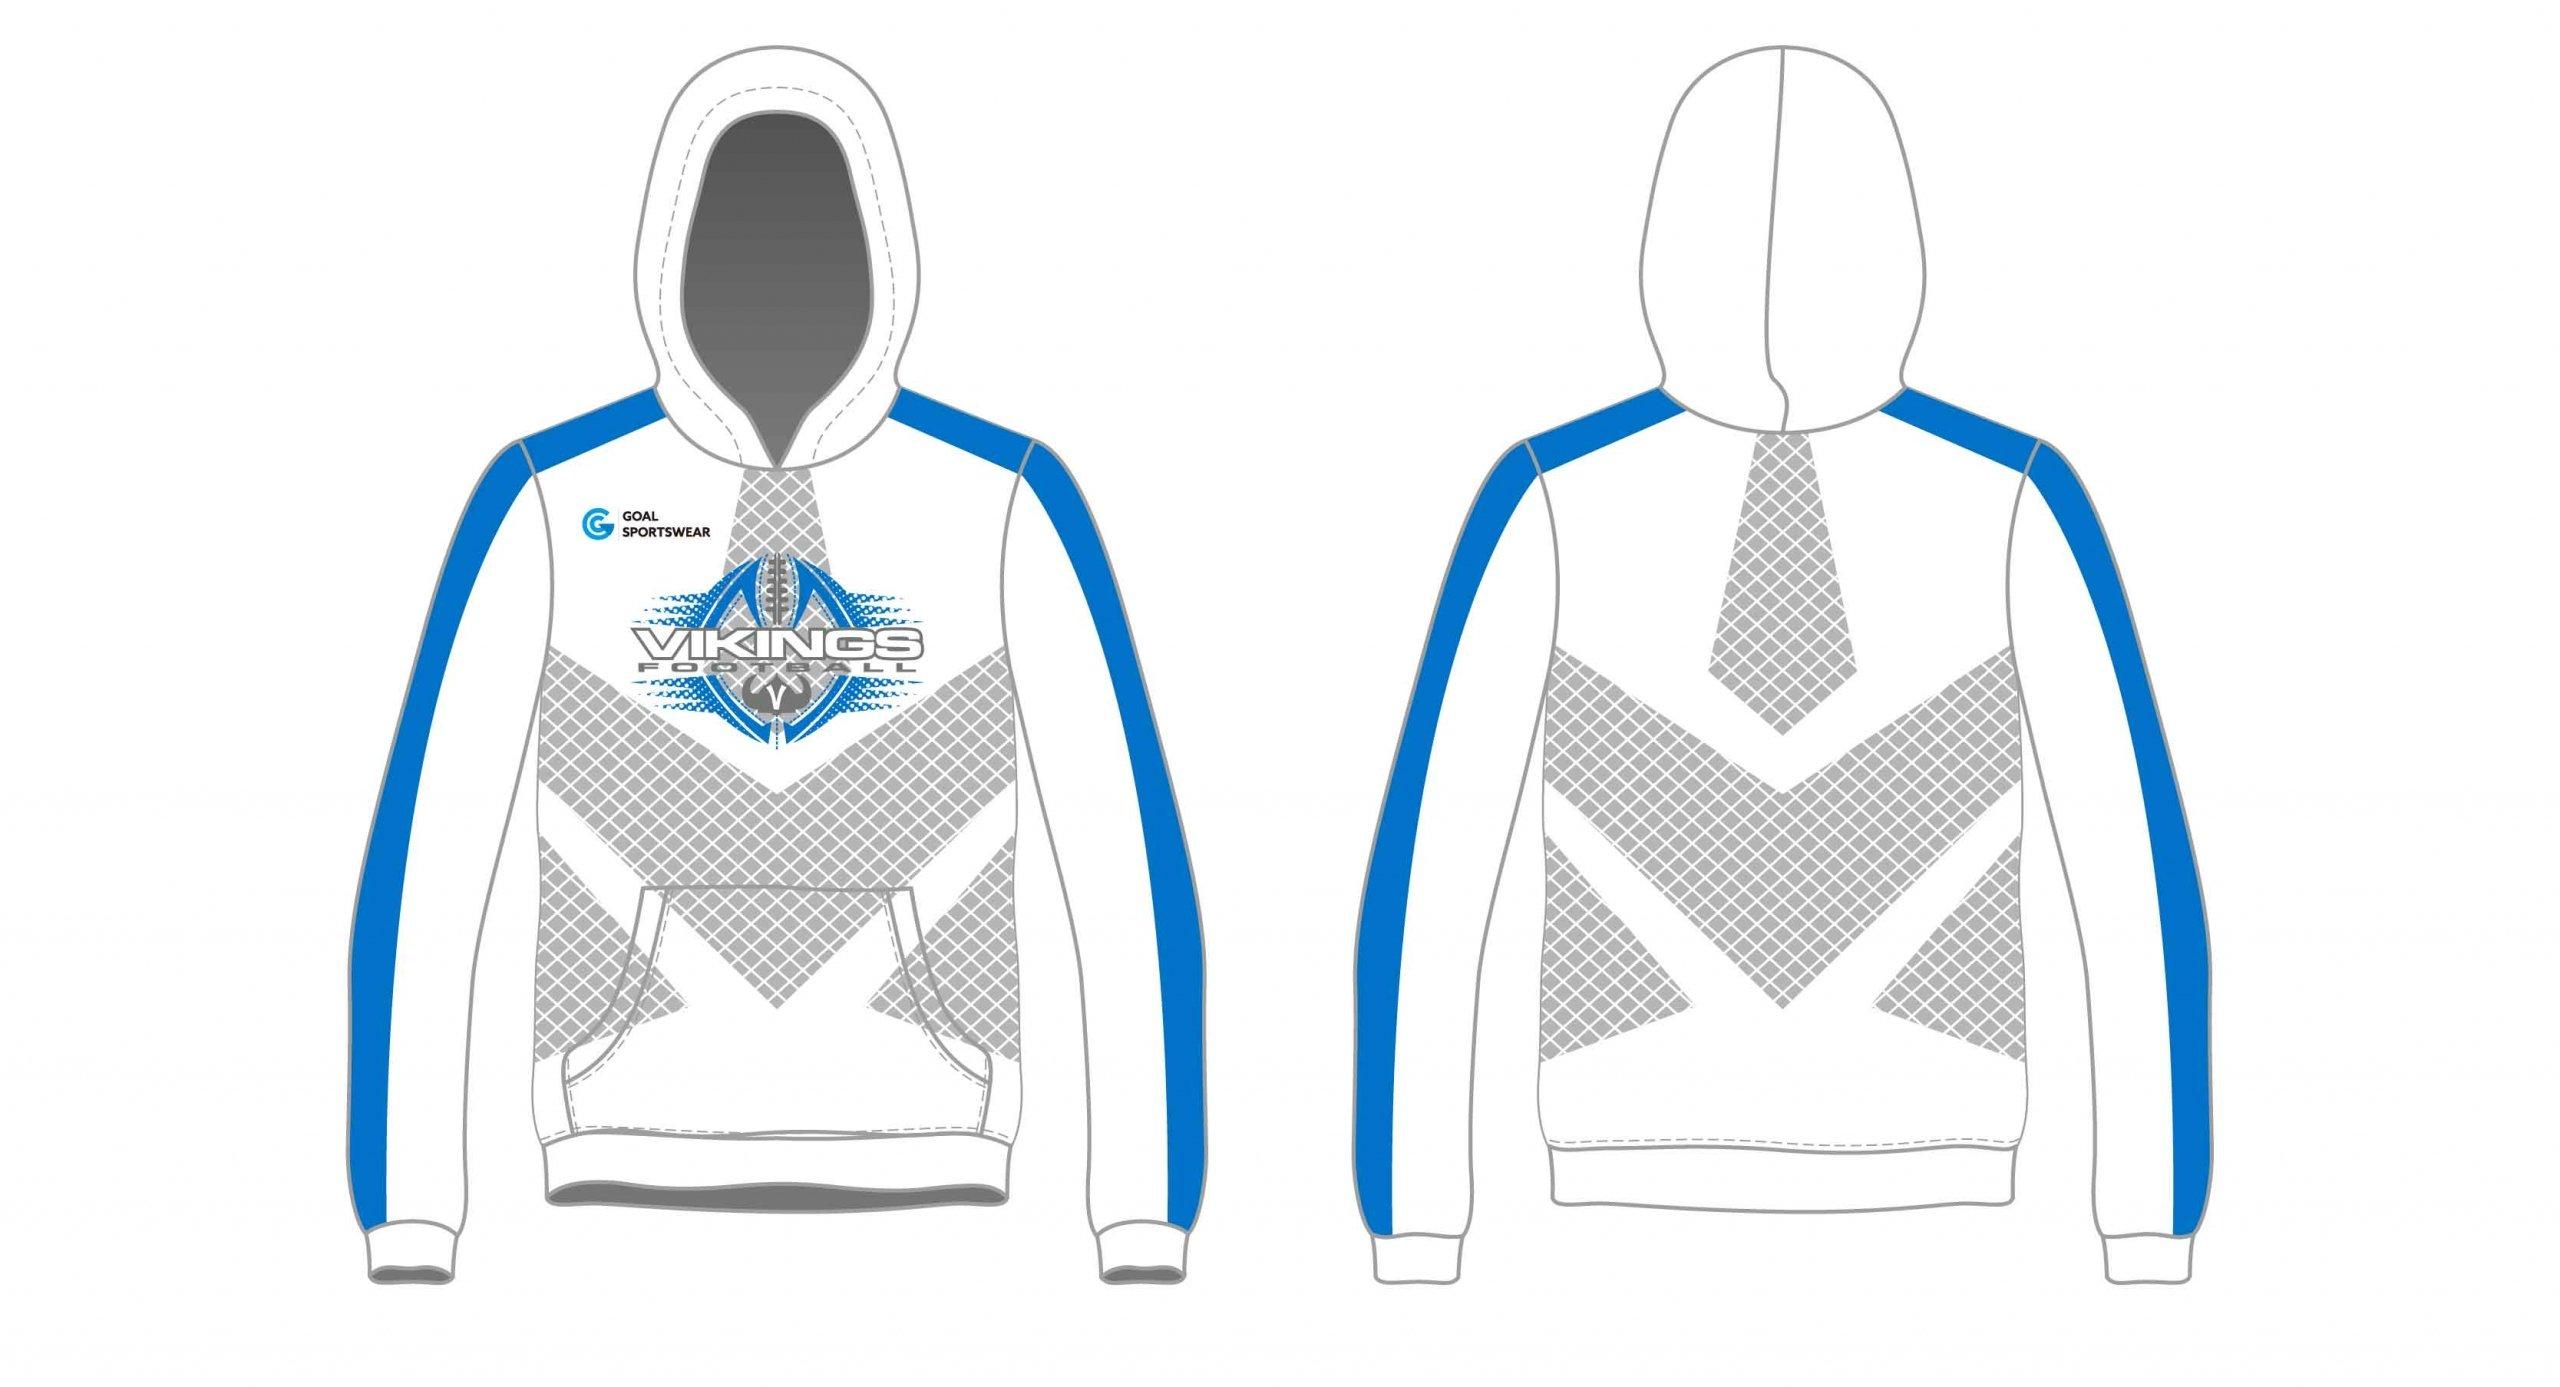 wholesale 100% polyester custom sublimated printed wrestling sweatshirts